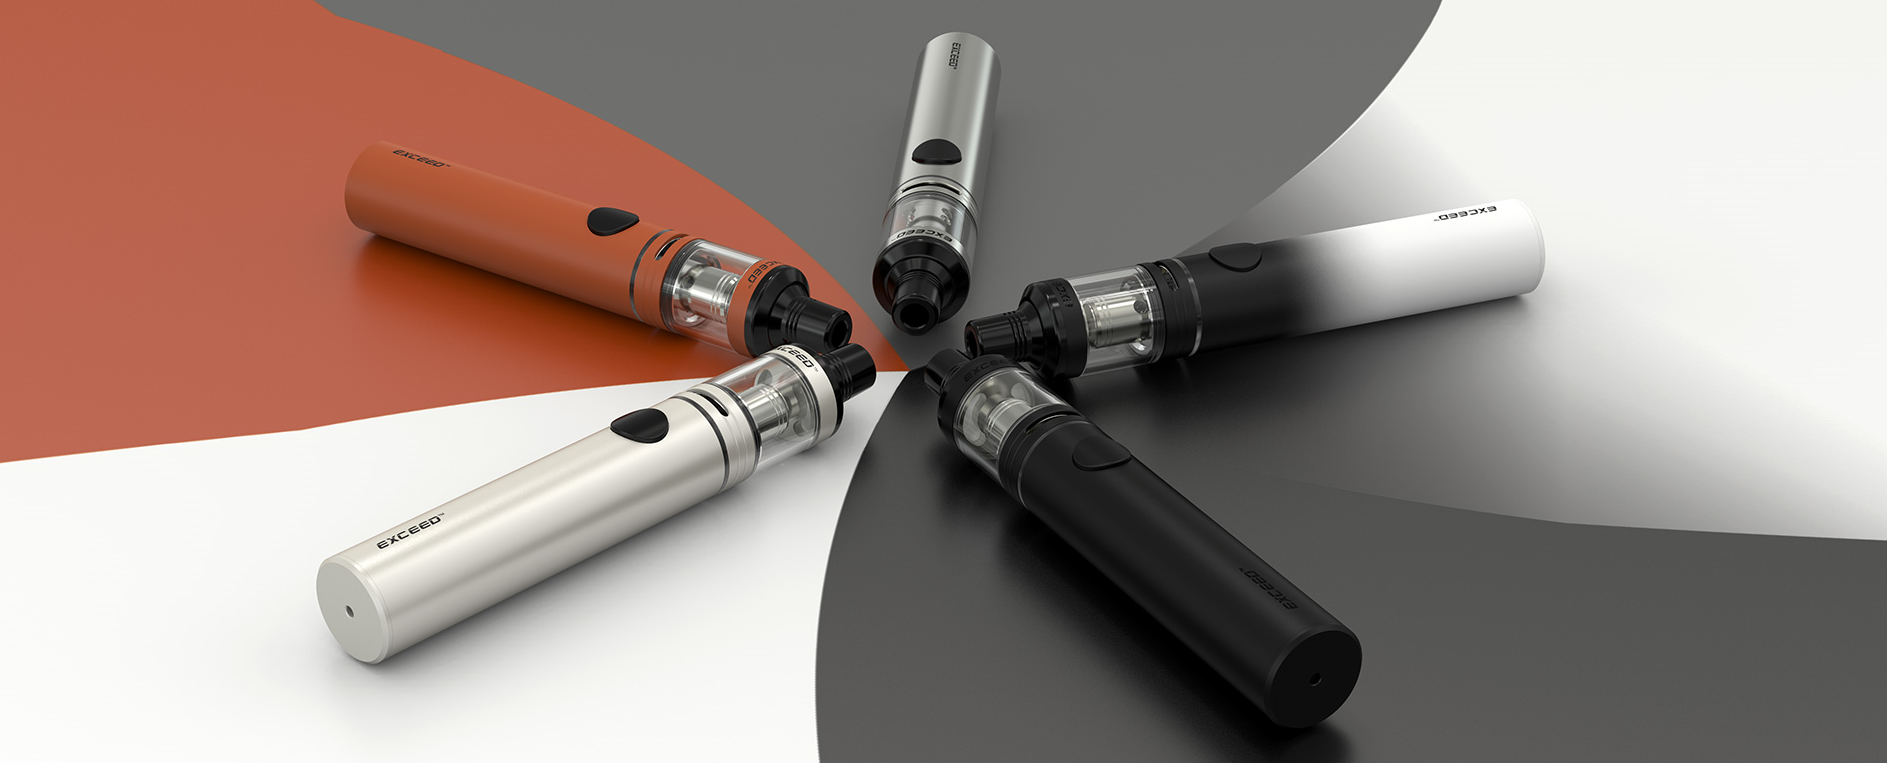 joyetech-exceed-d19-elektronicka-cigareta-1500mah-barevne-provedeni